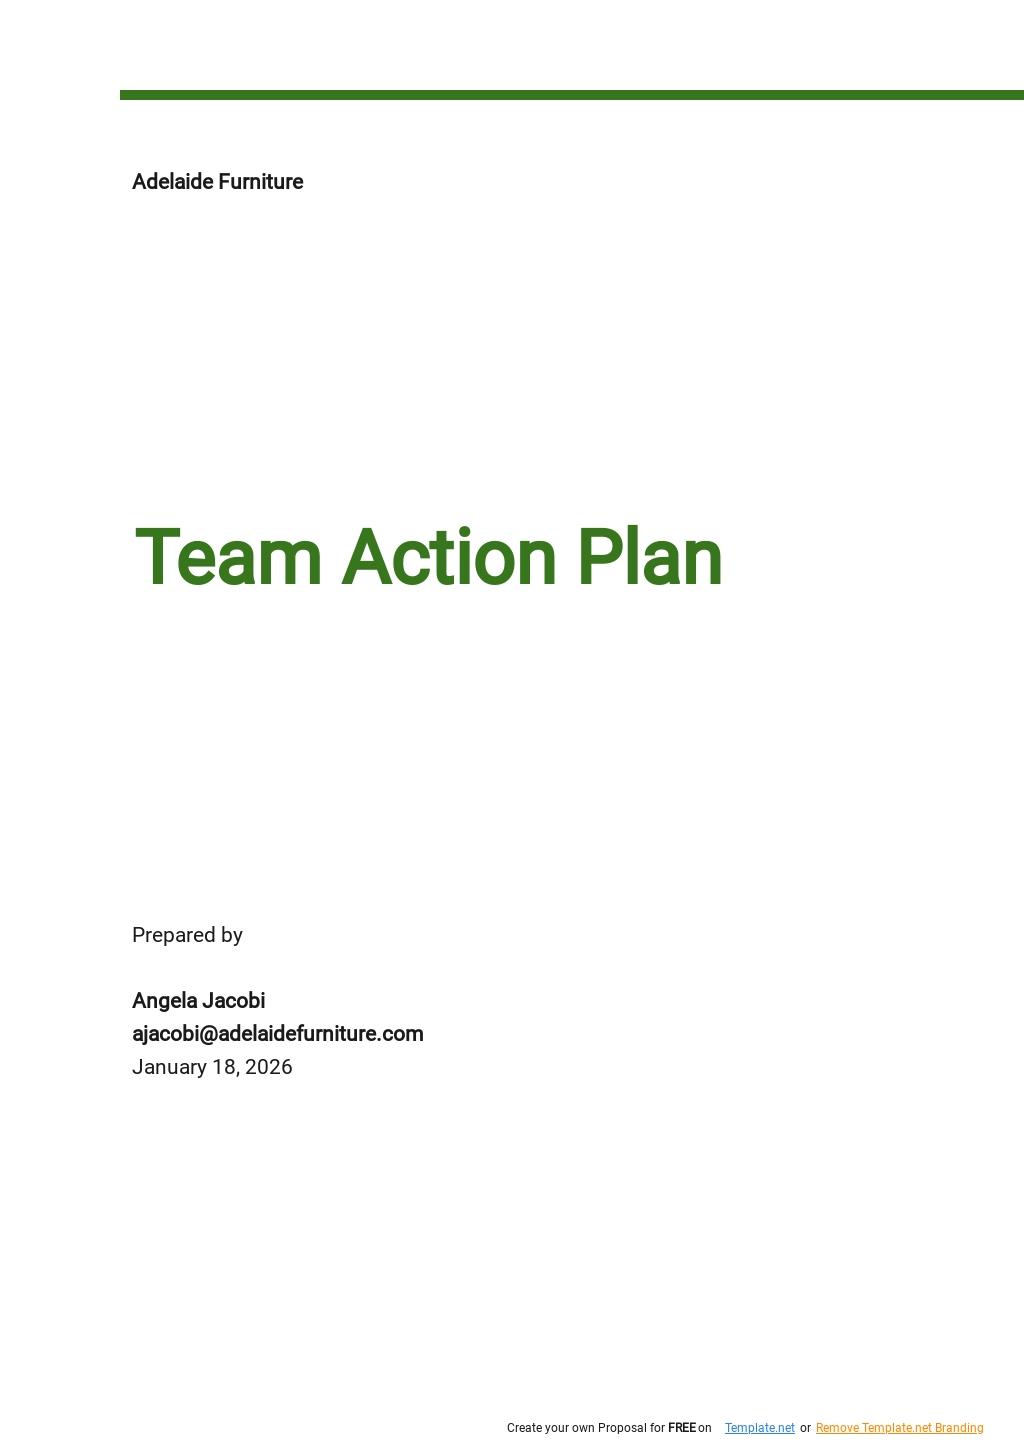 Team Action Plan Template.jpe